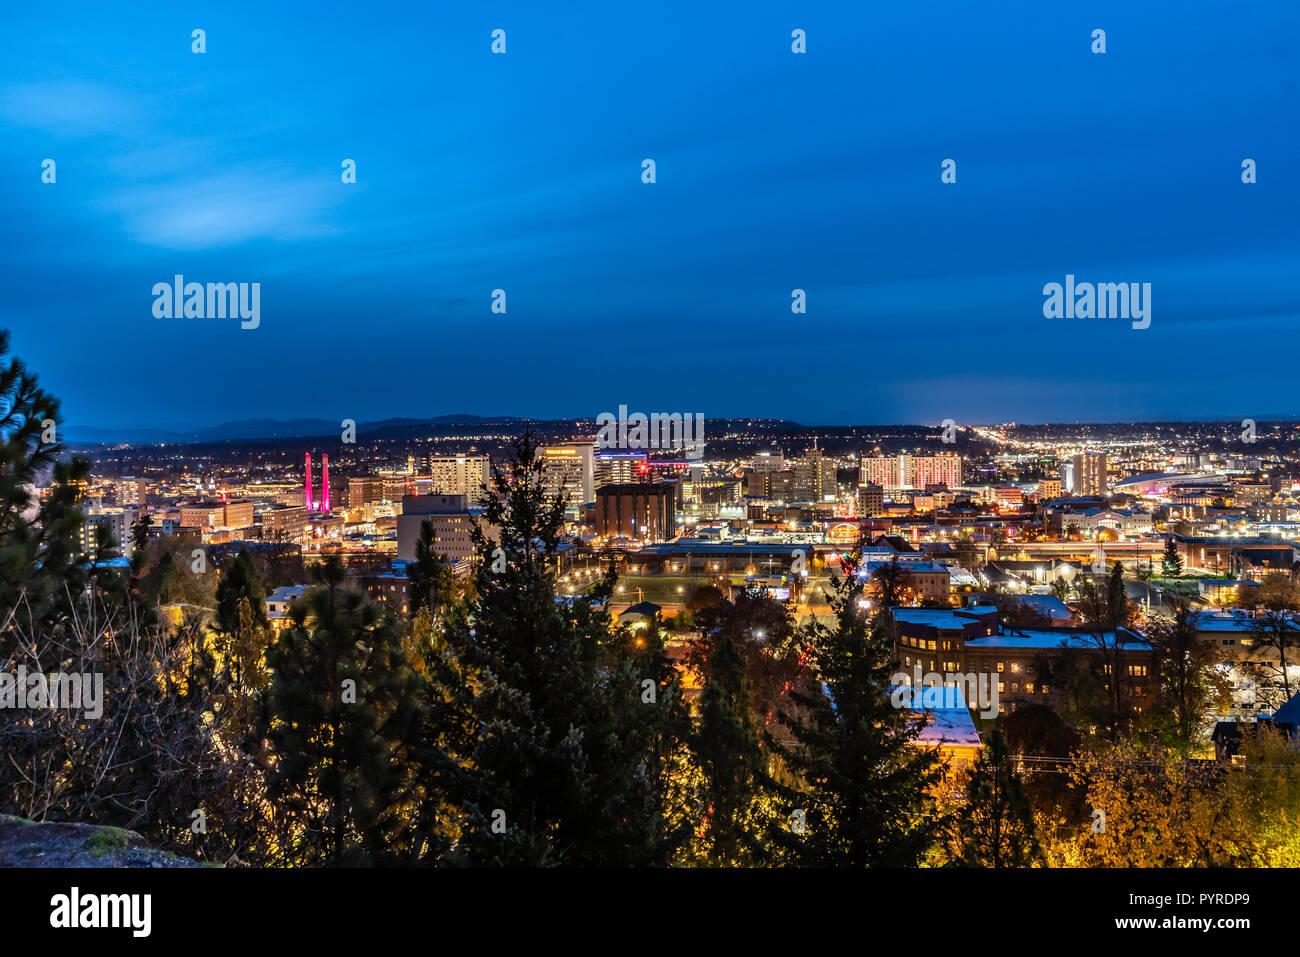 Night Lights Of Spokane, Washington, USA Stock Photo: 223635841 - Alamy